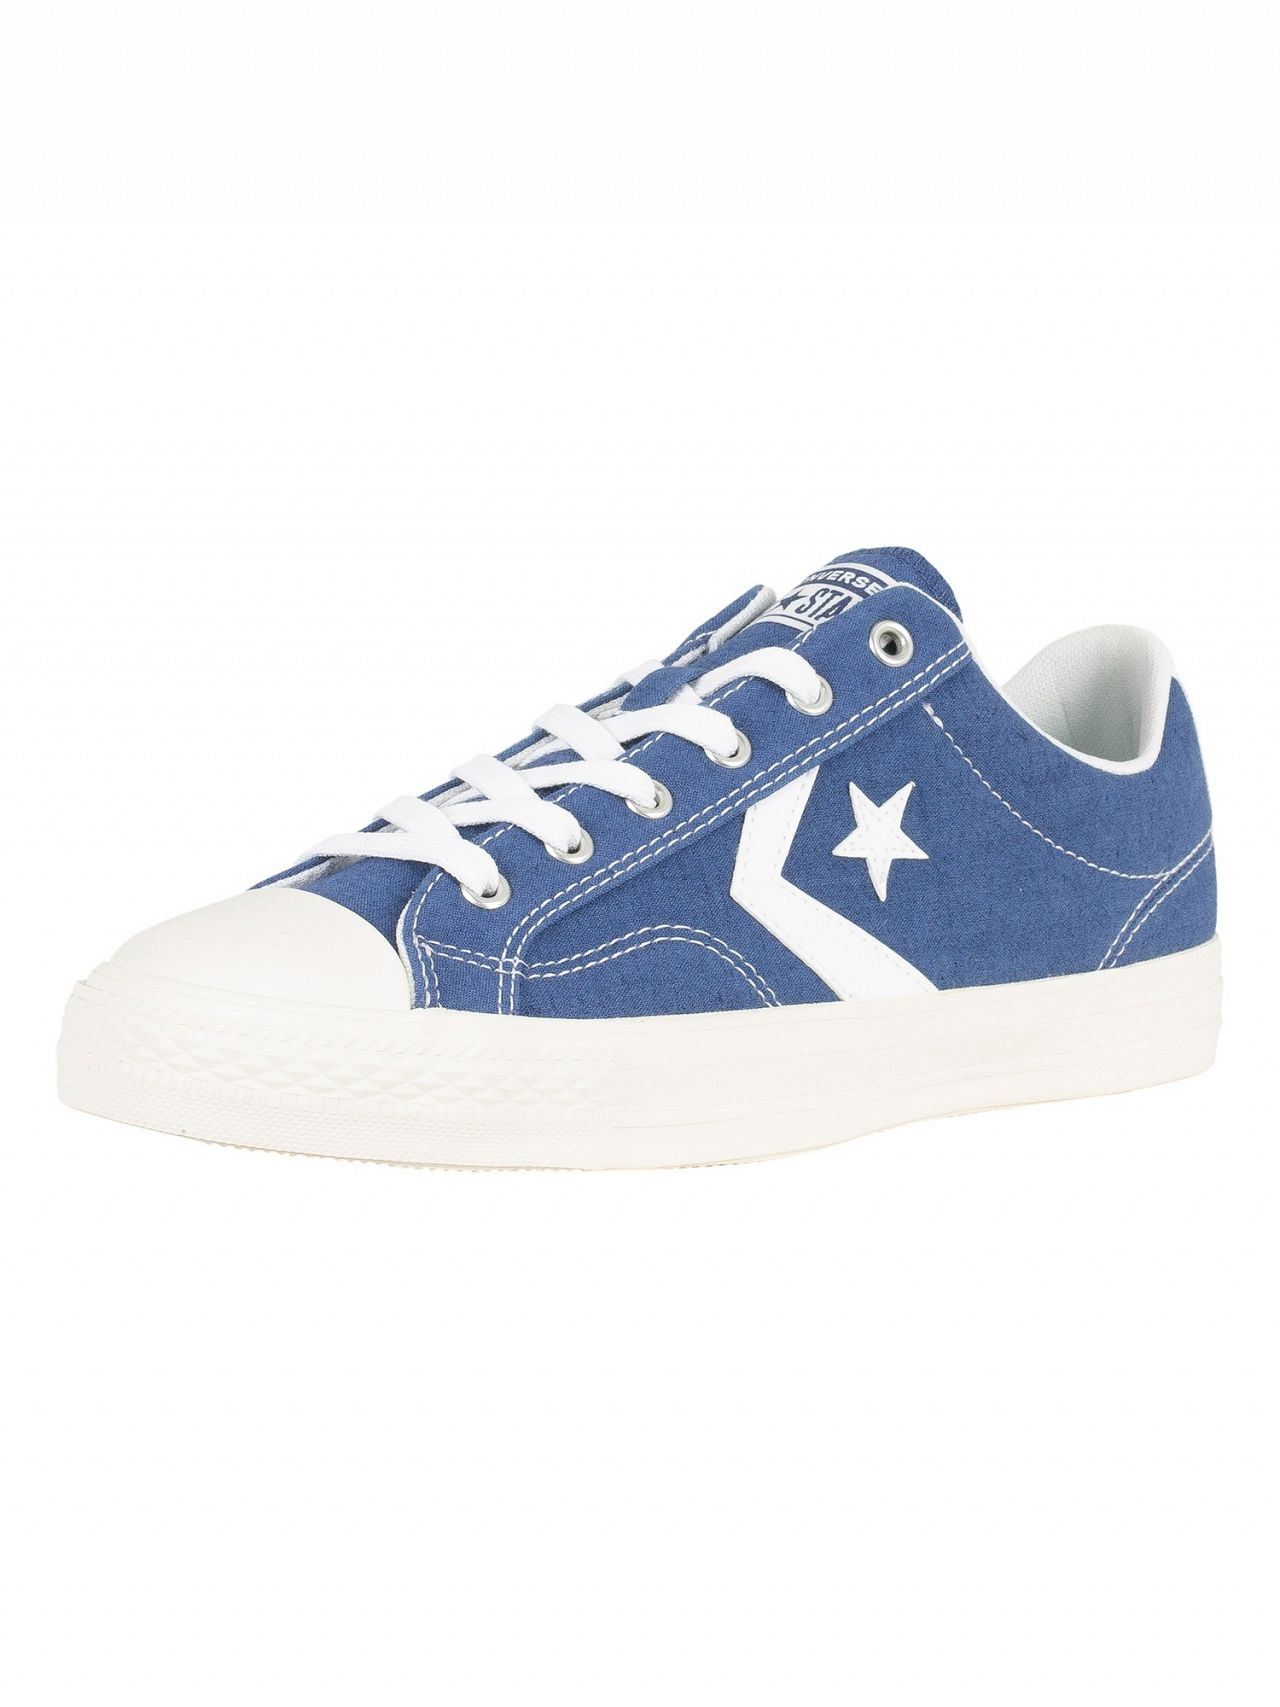 30a319a2913e ... buy converse mason blue white star player ox canvas trainers e6943 58006